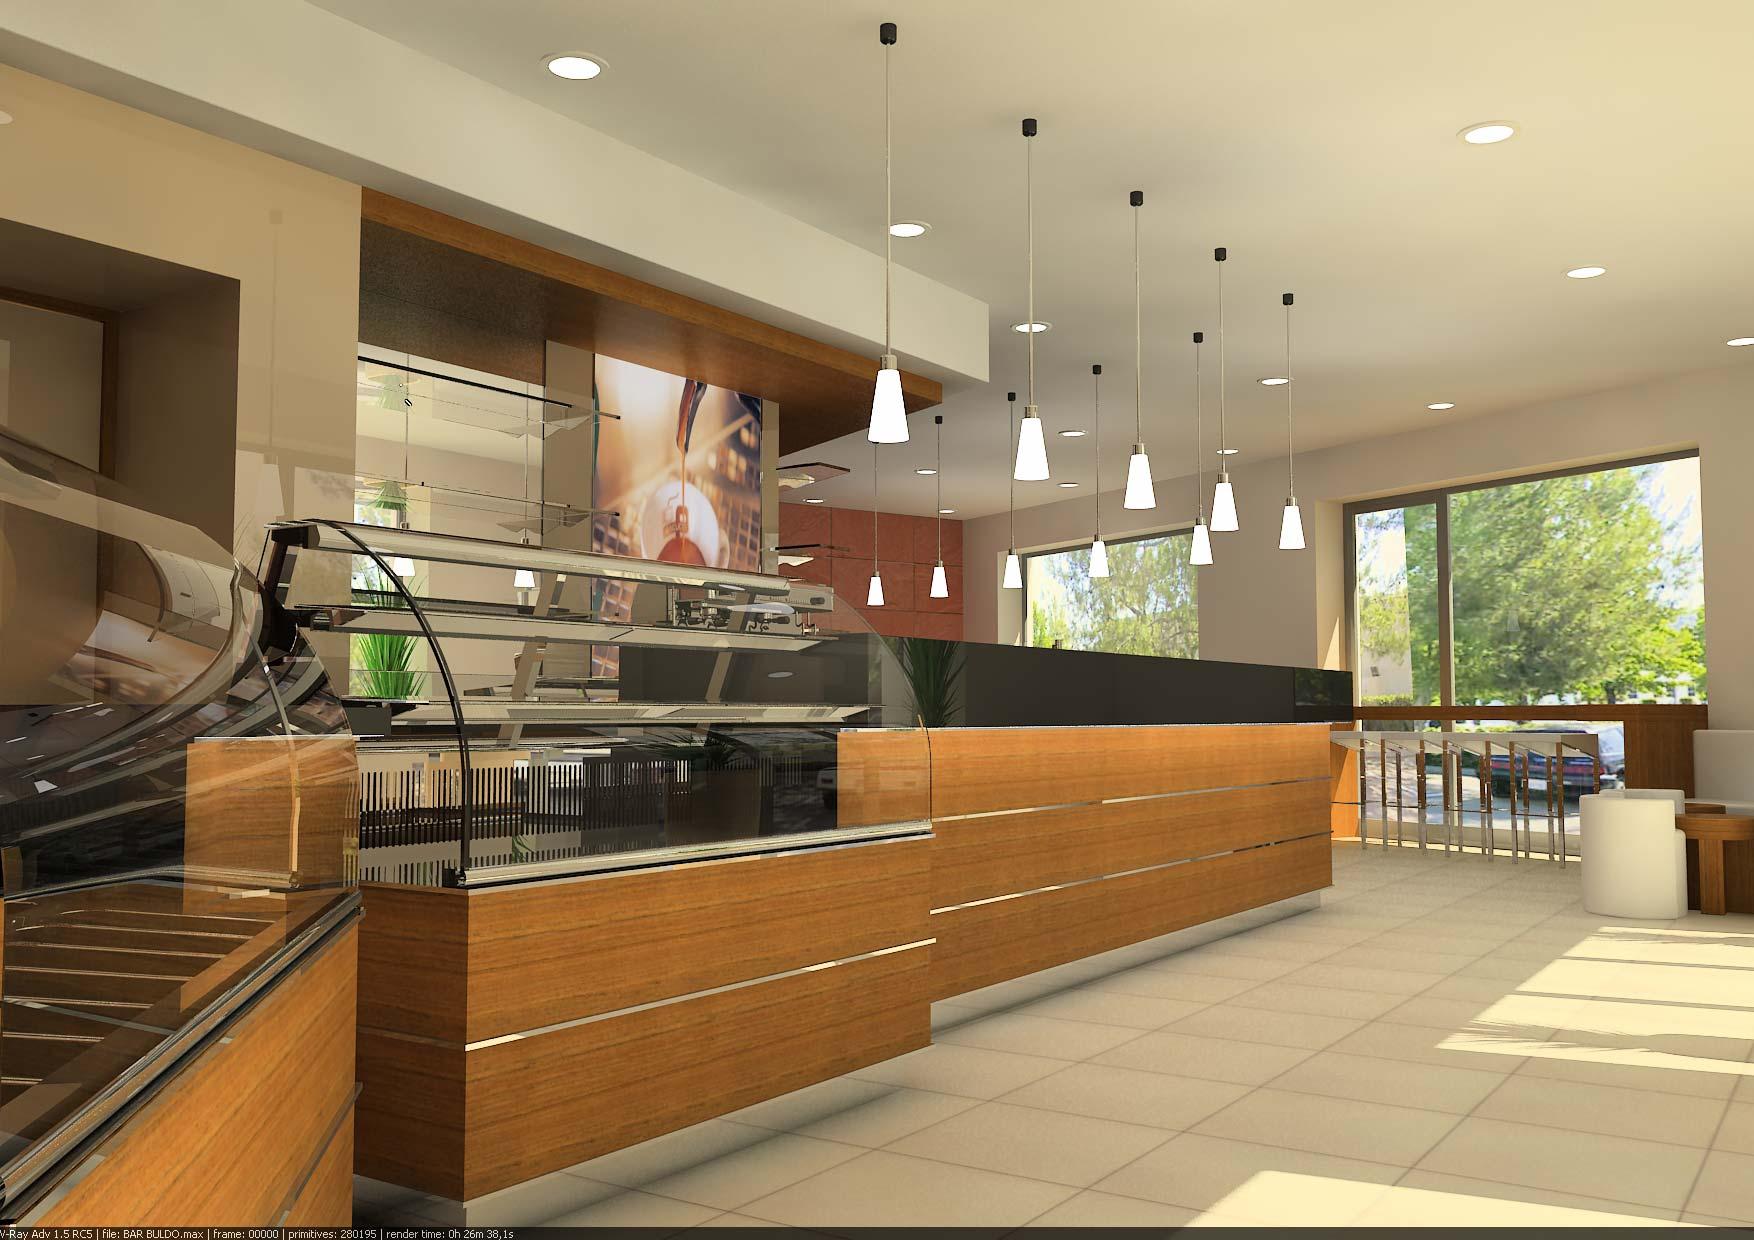 Arredamenti bar torino immagine with arredamenti bar for Gallery home arredamenti torino